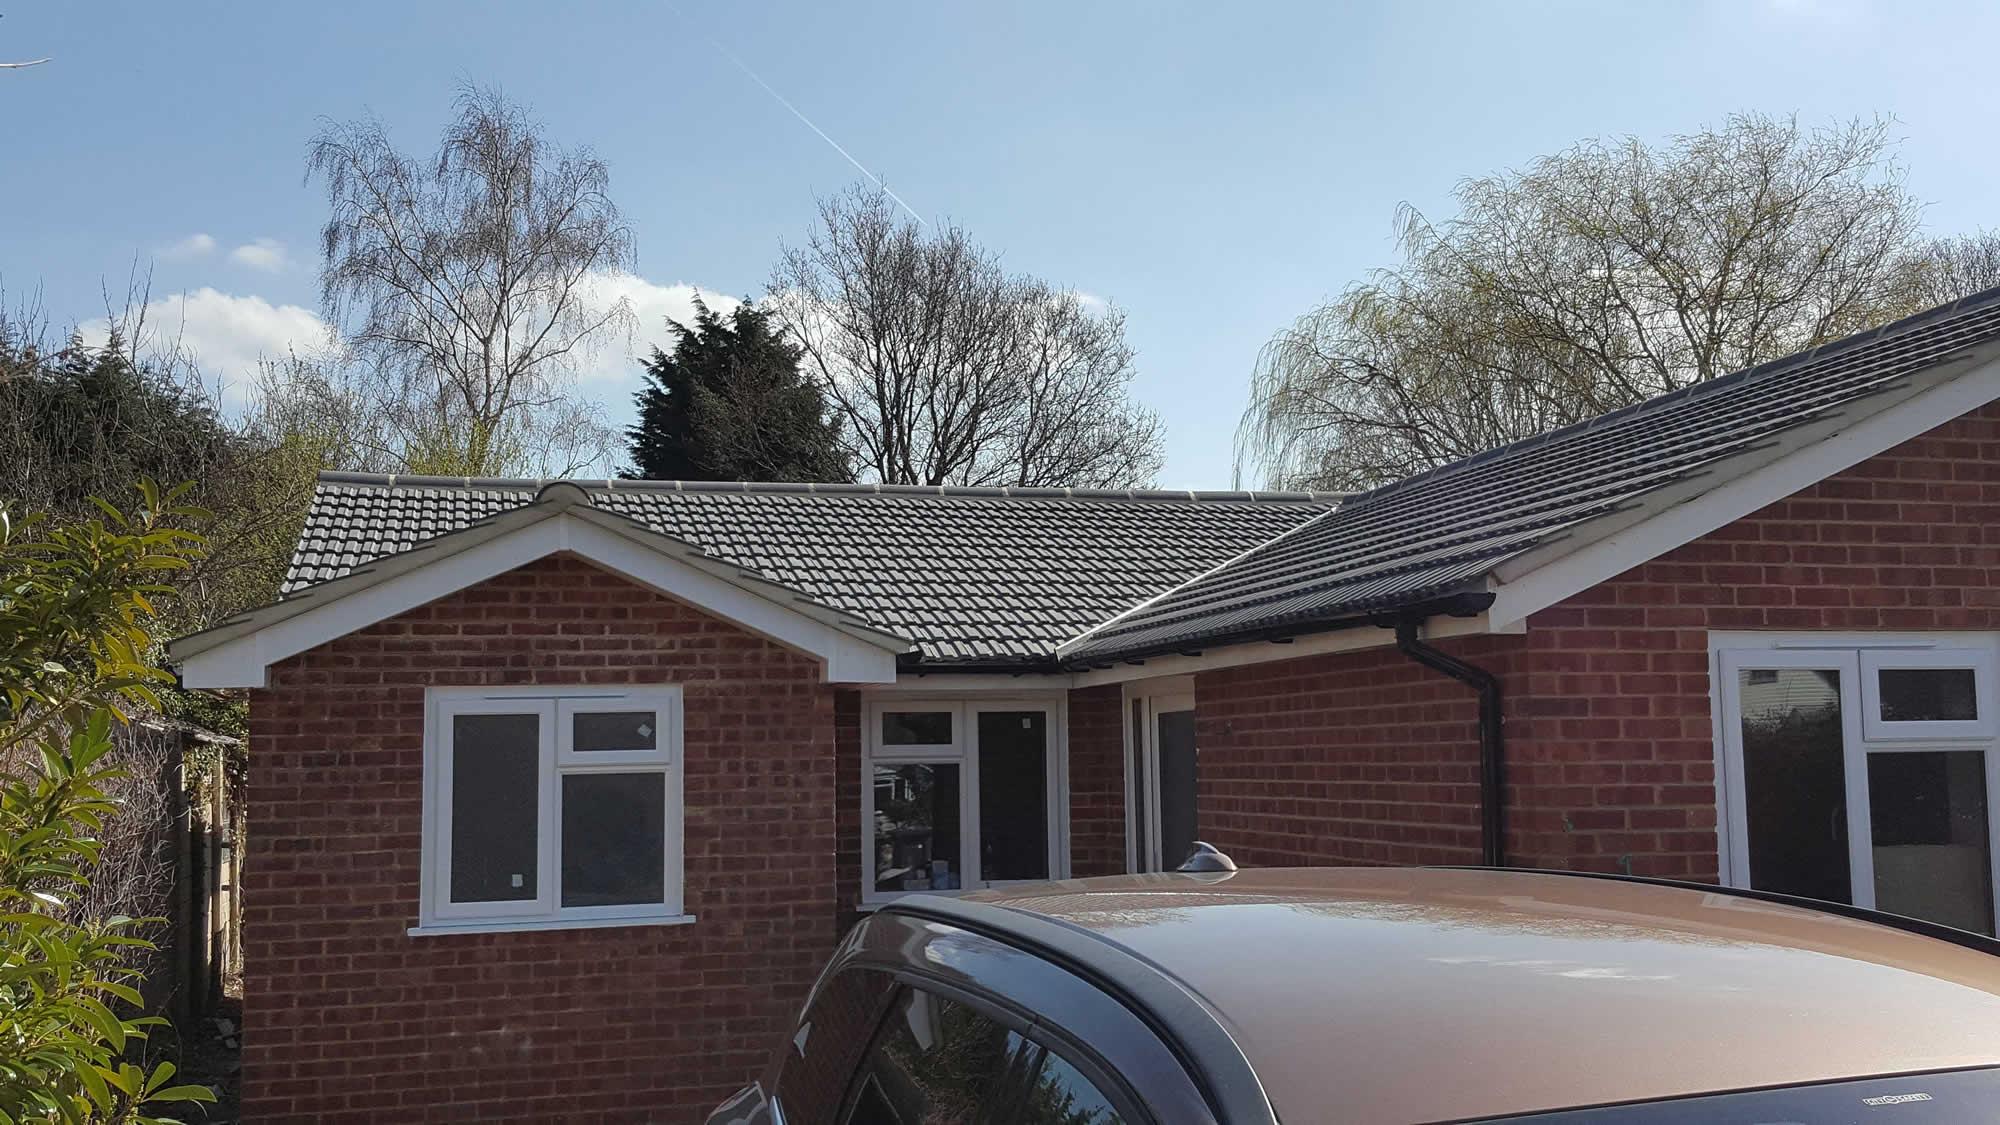 Daniel Ellwood Roofer -  Services to Weybridge & Surrey